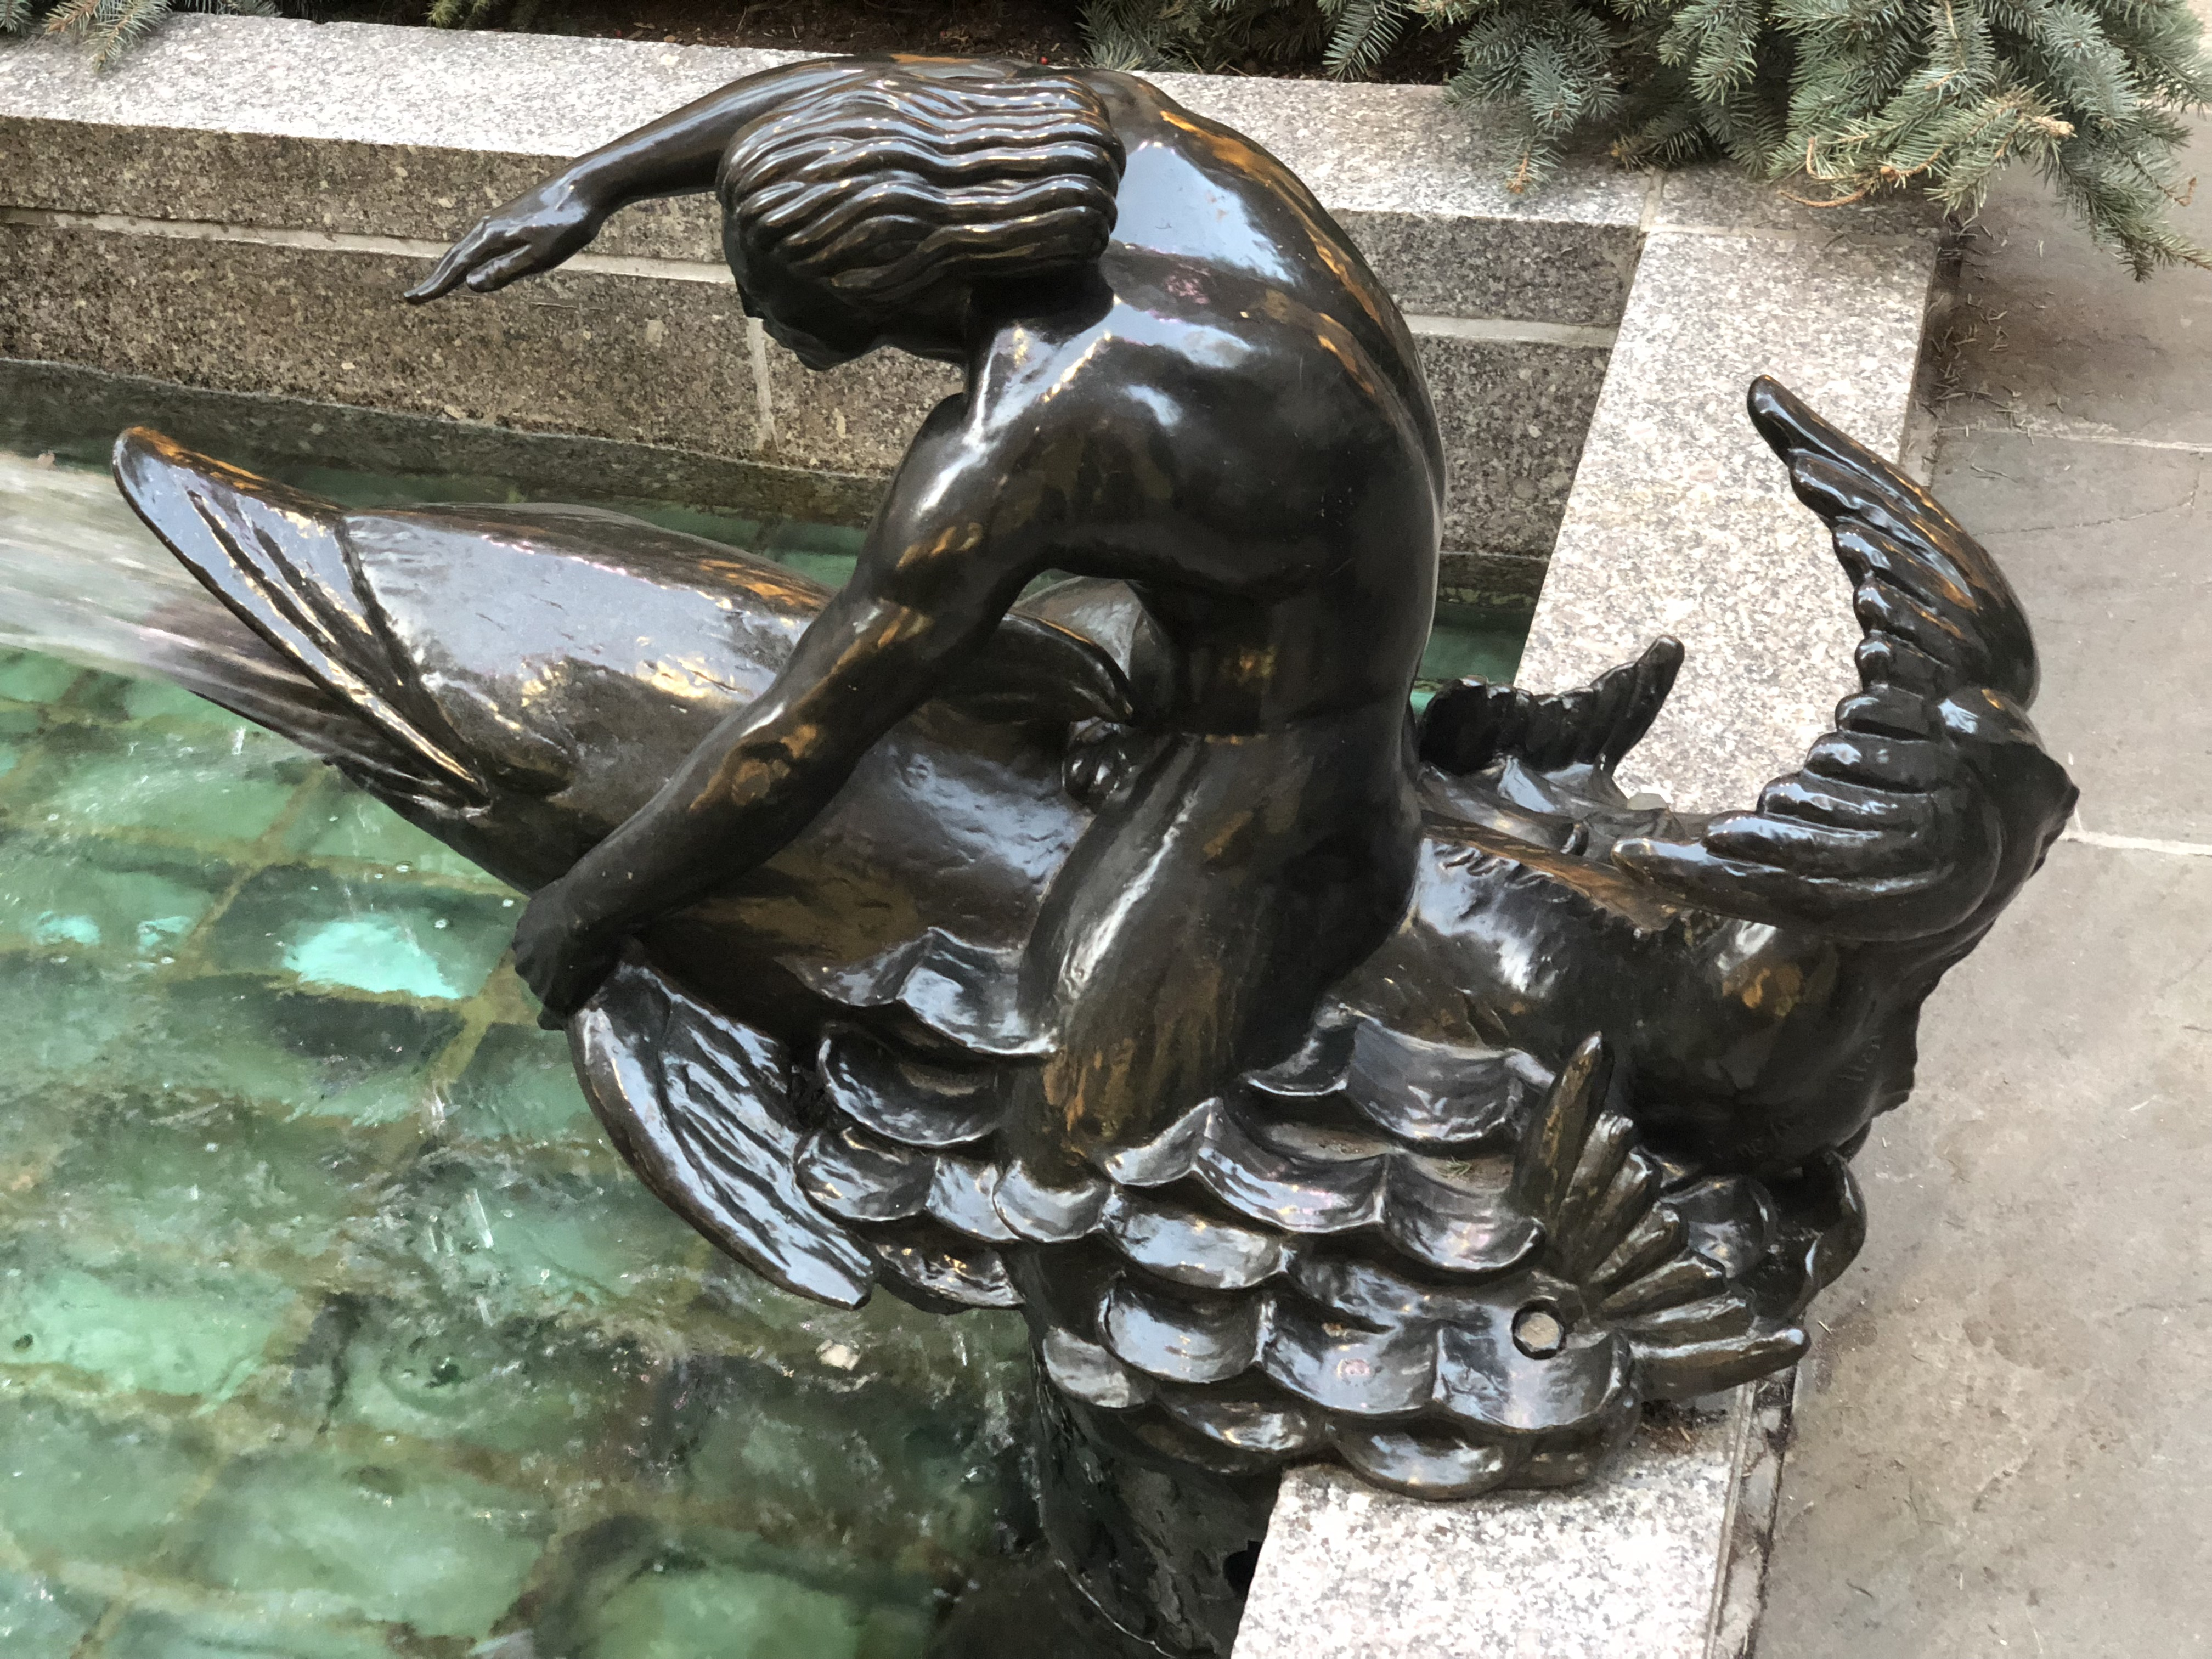 Day 7: Rockefeller Center Fountain Statue